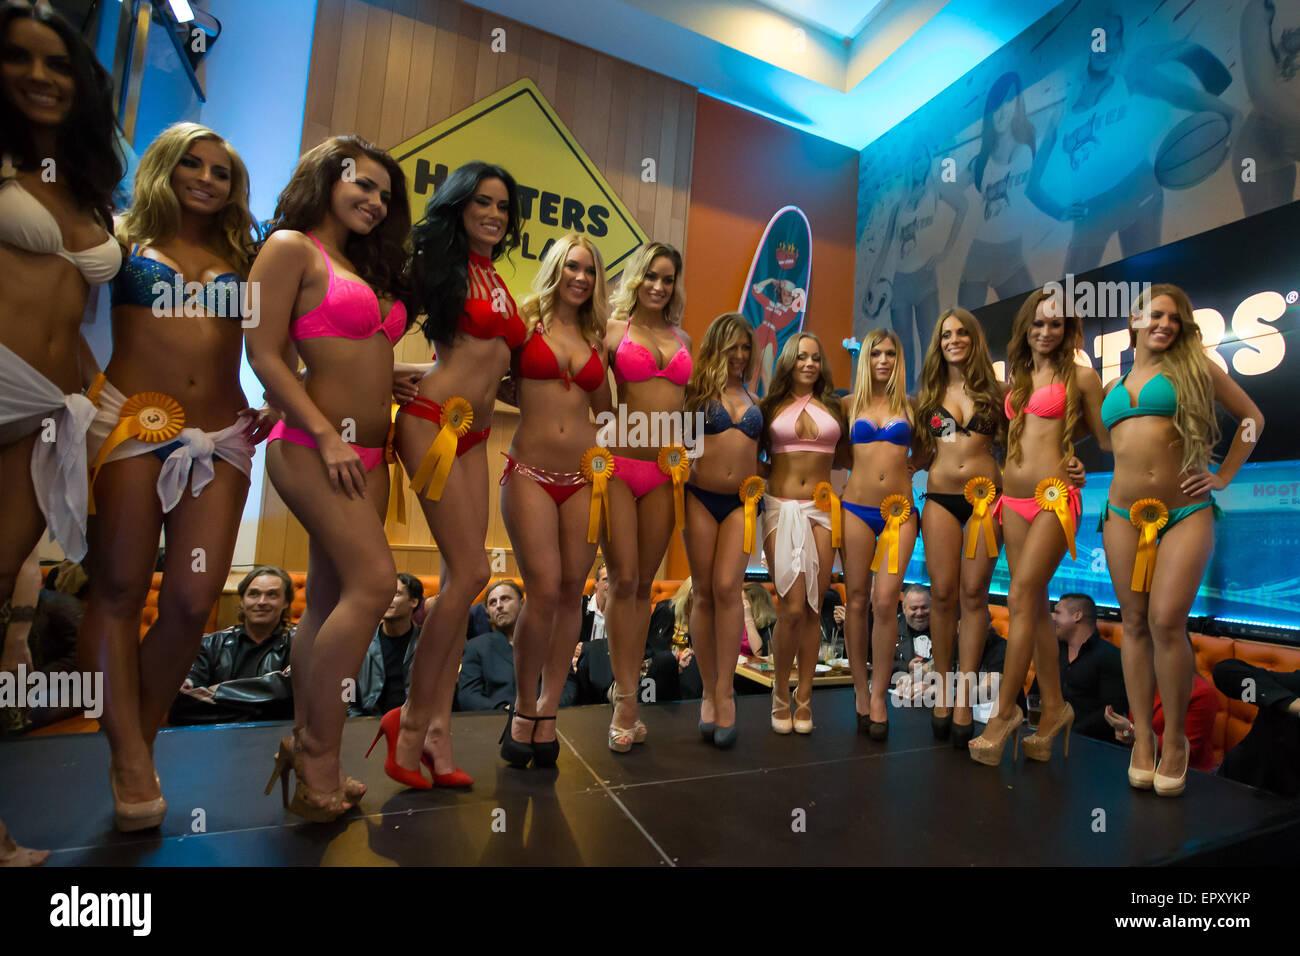 bikini competition edmonton